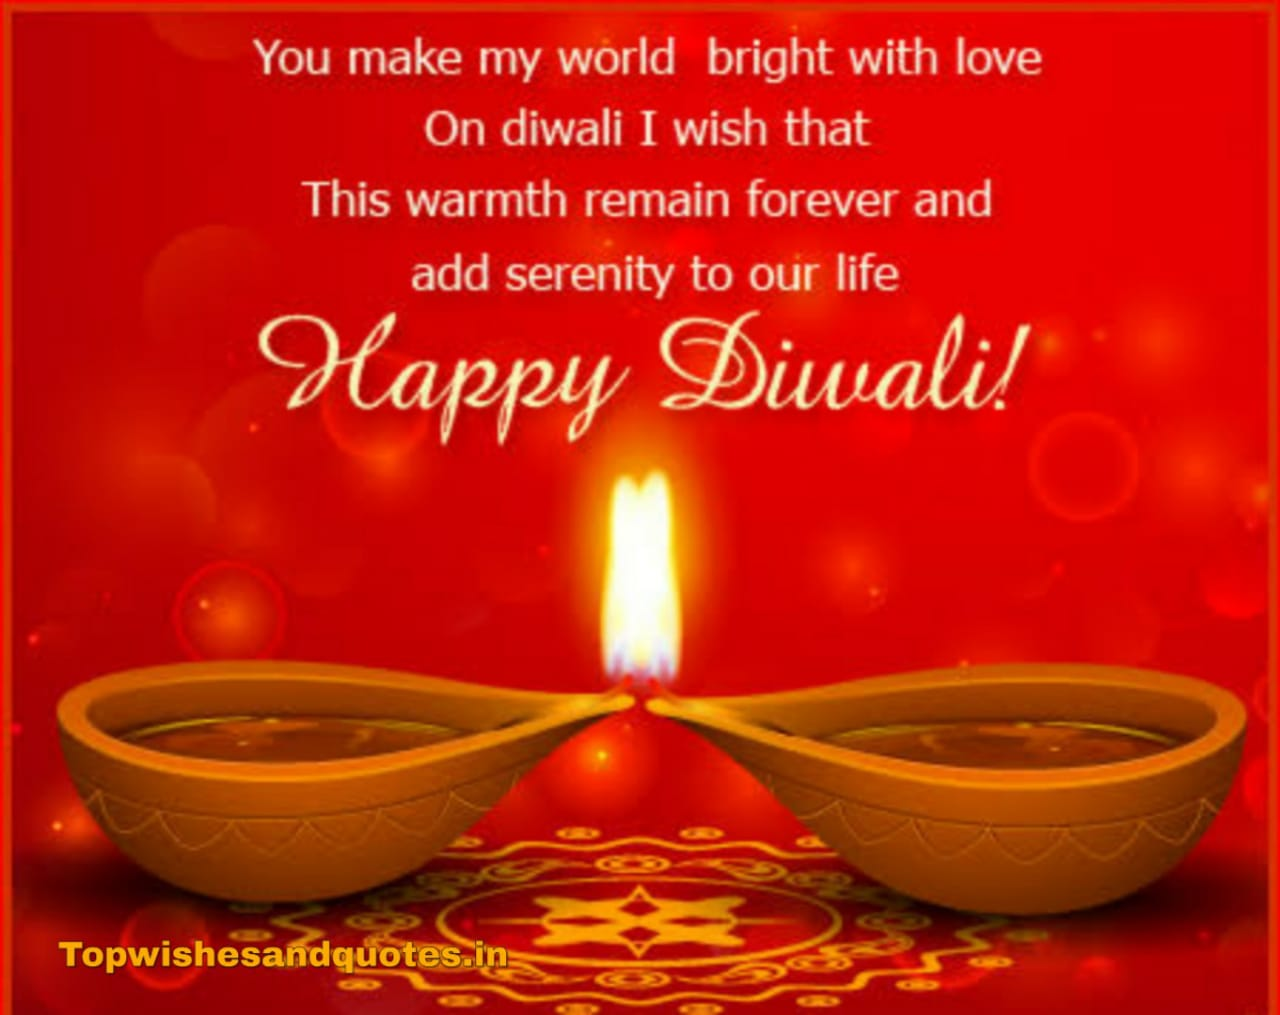 Happy diwali wishes, happy diwali quotes, happy diwali status, happy diwali photo